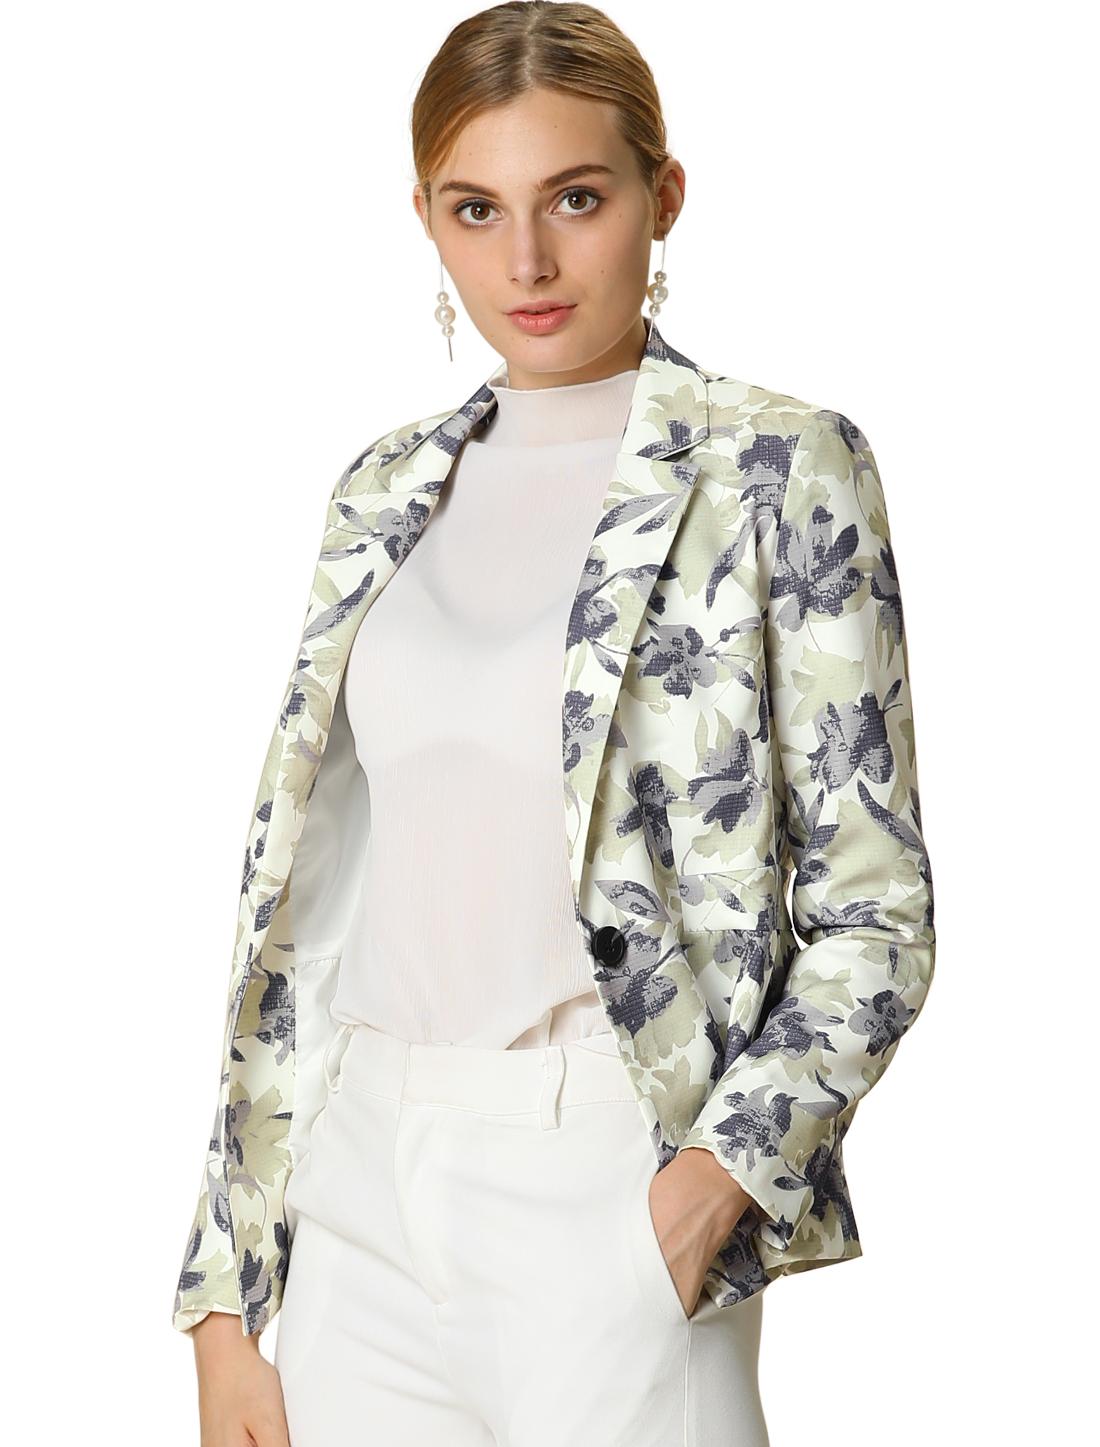 Women's Floral Print One Button Notched Lapel Blazer Jacket White M